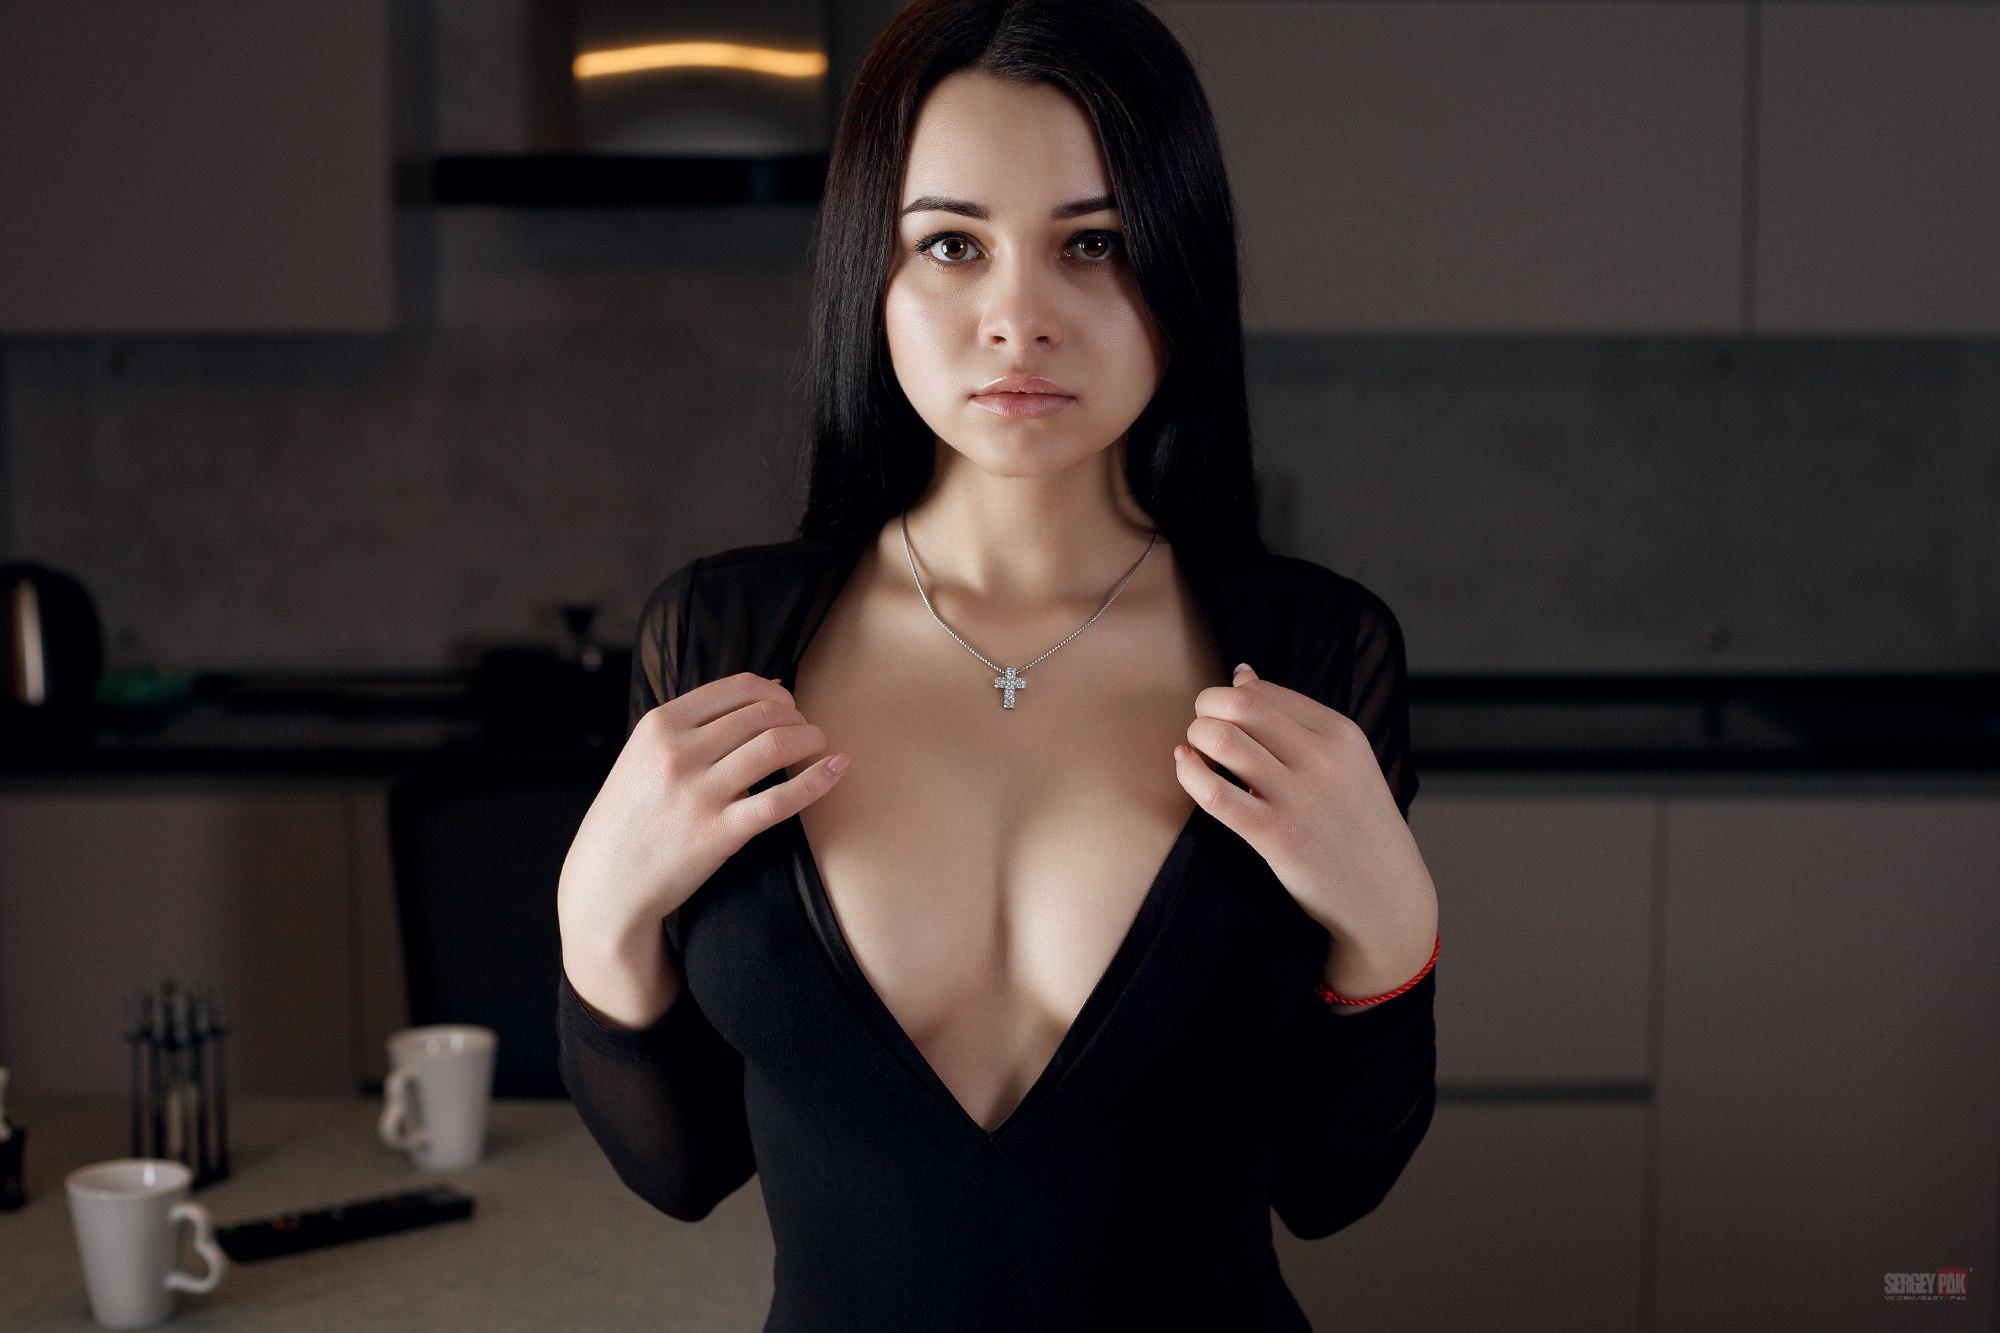 Bigger Breasts Enlargement Cream Phyto Estrogen Formula Larger Bust Firming Aid